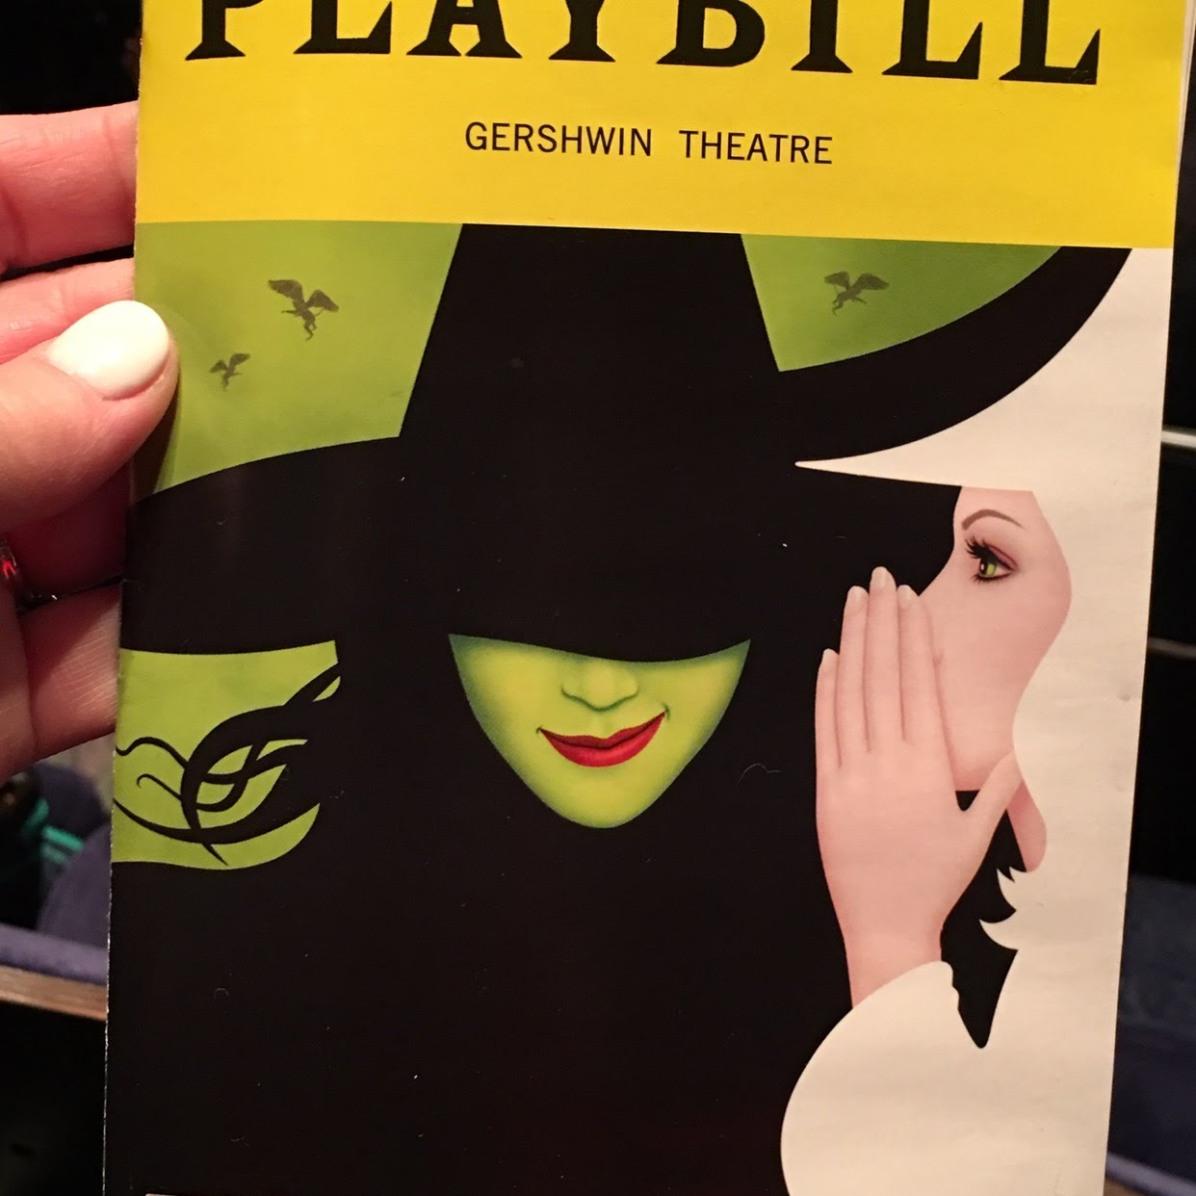 Wicked ... LOVED IT!